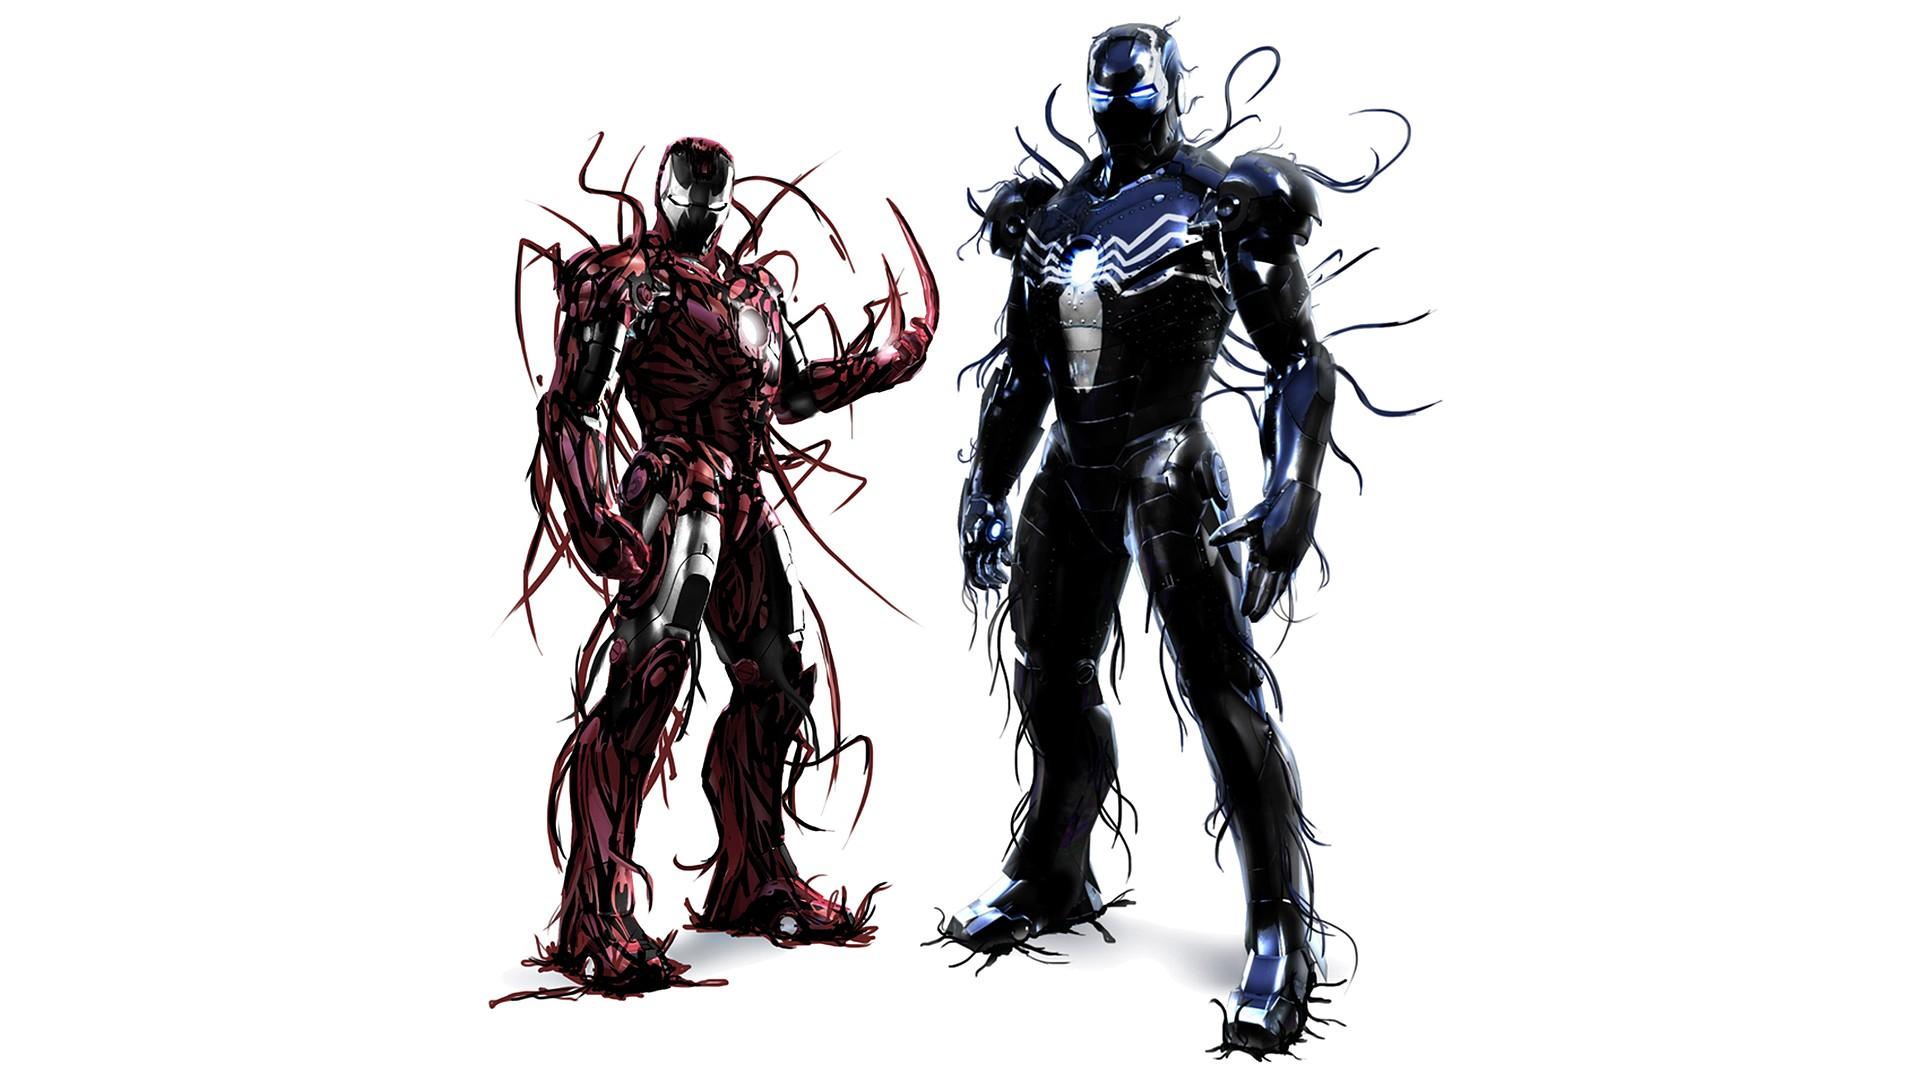 Wallpapers Iron Man Spawn Venom Carnage Marvel Comics symbiote 1920x1080